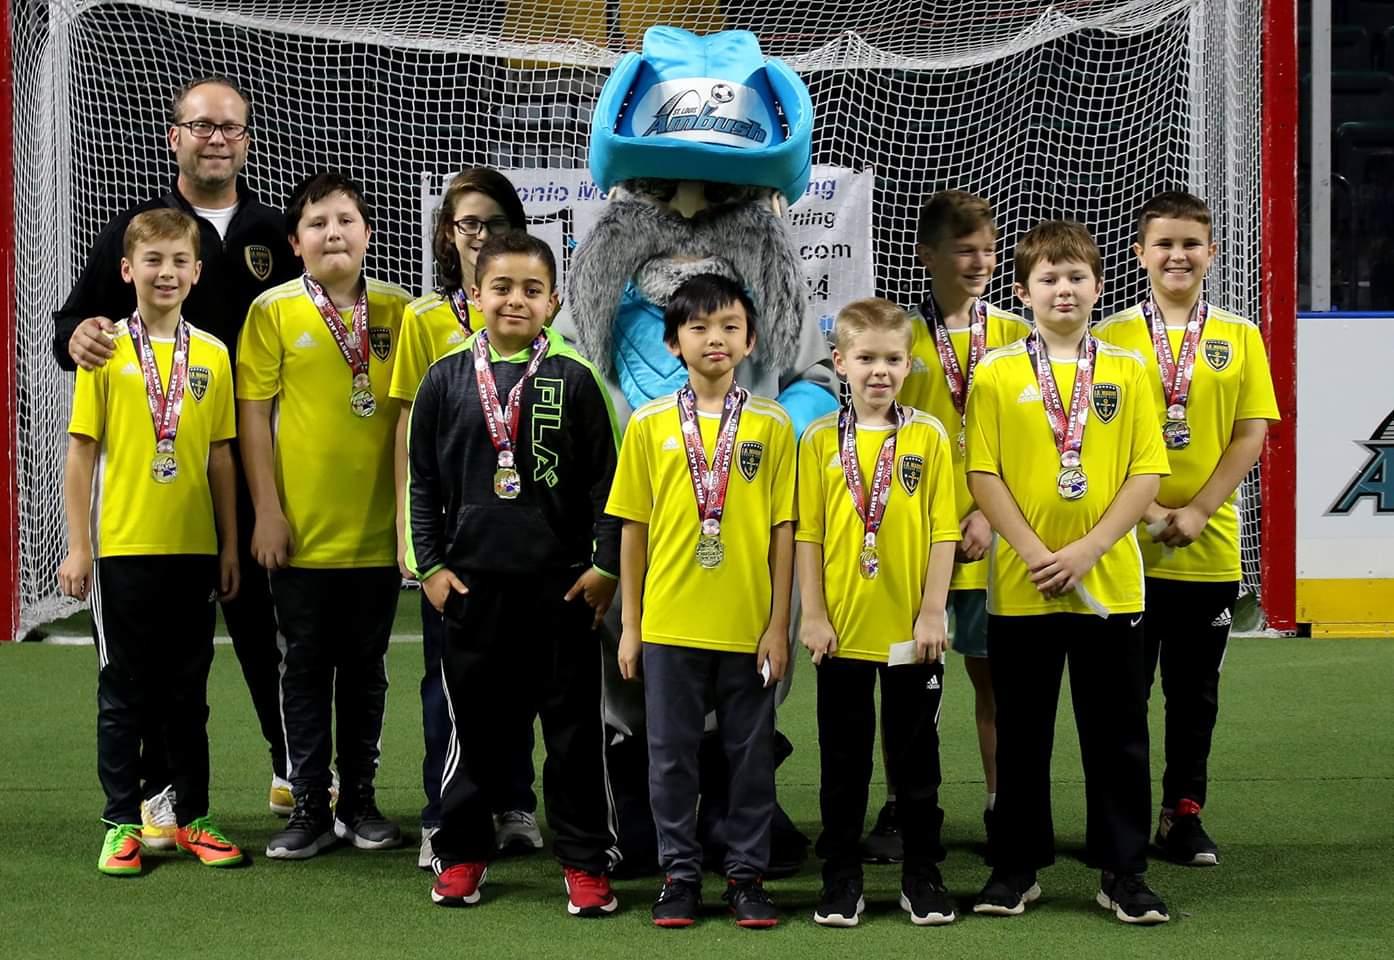 2007-lembeck-team-photo